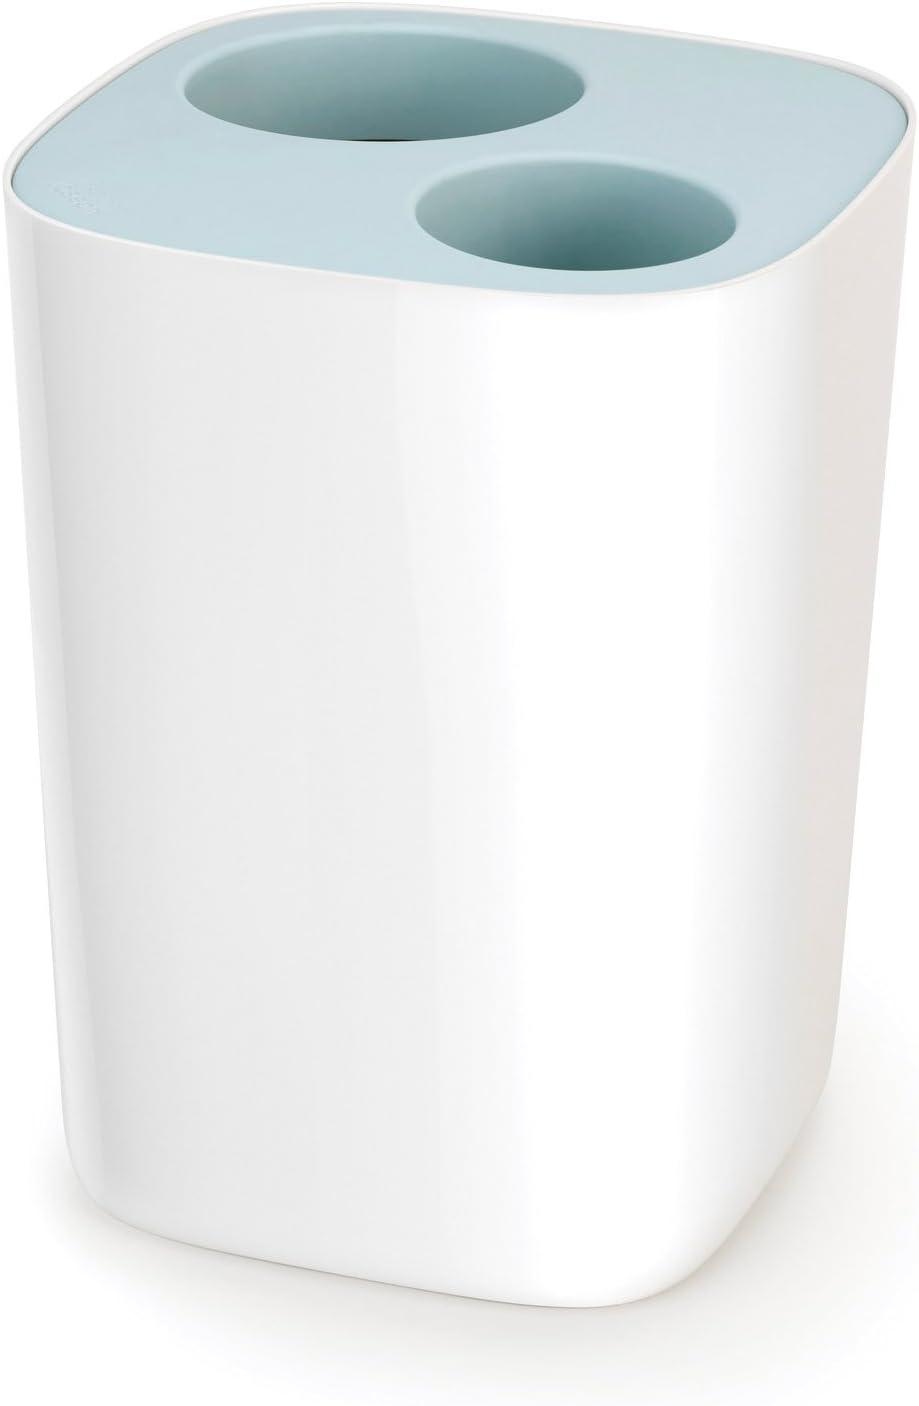 Joseph Joseph Split Trash Can Recycle Bin Dual Compartments Removable Bucket, 2 gallon/8 liter, Blue